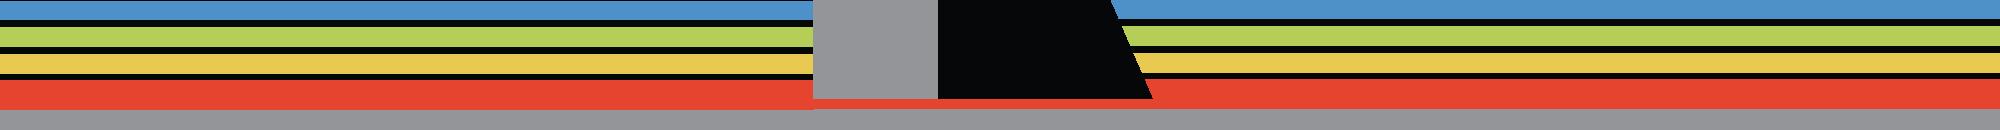 slideshow-elma-logo-1